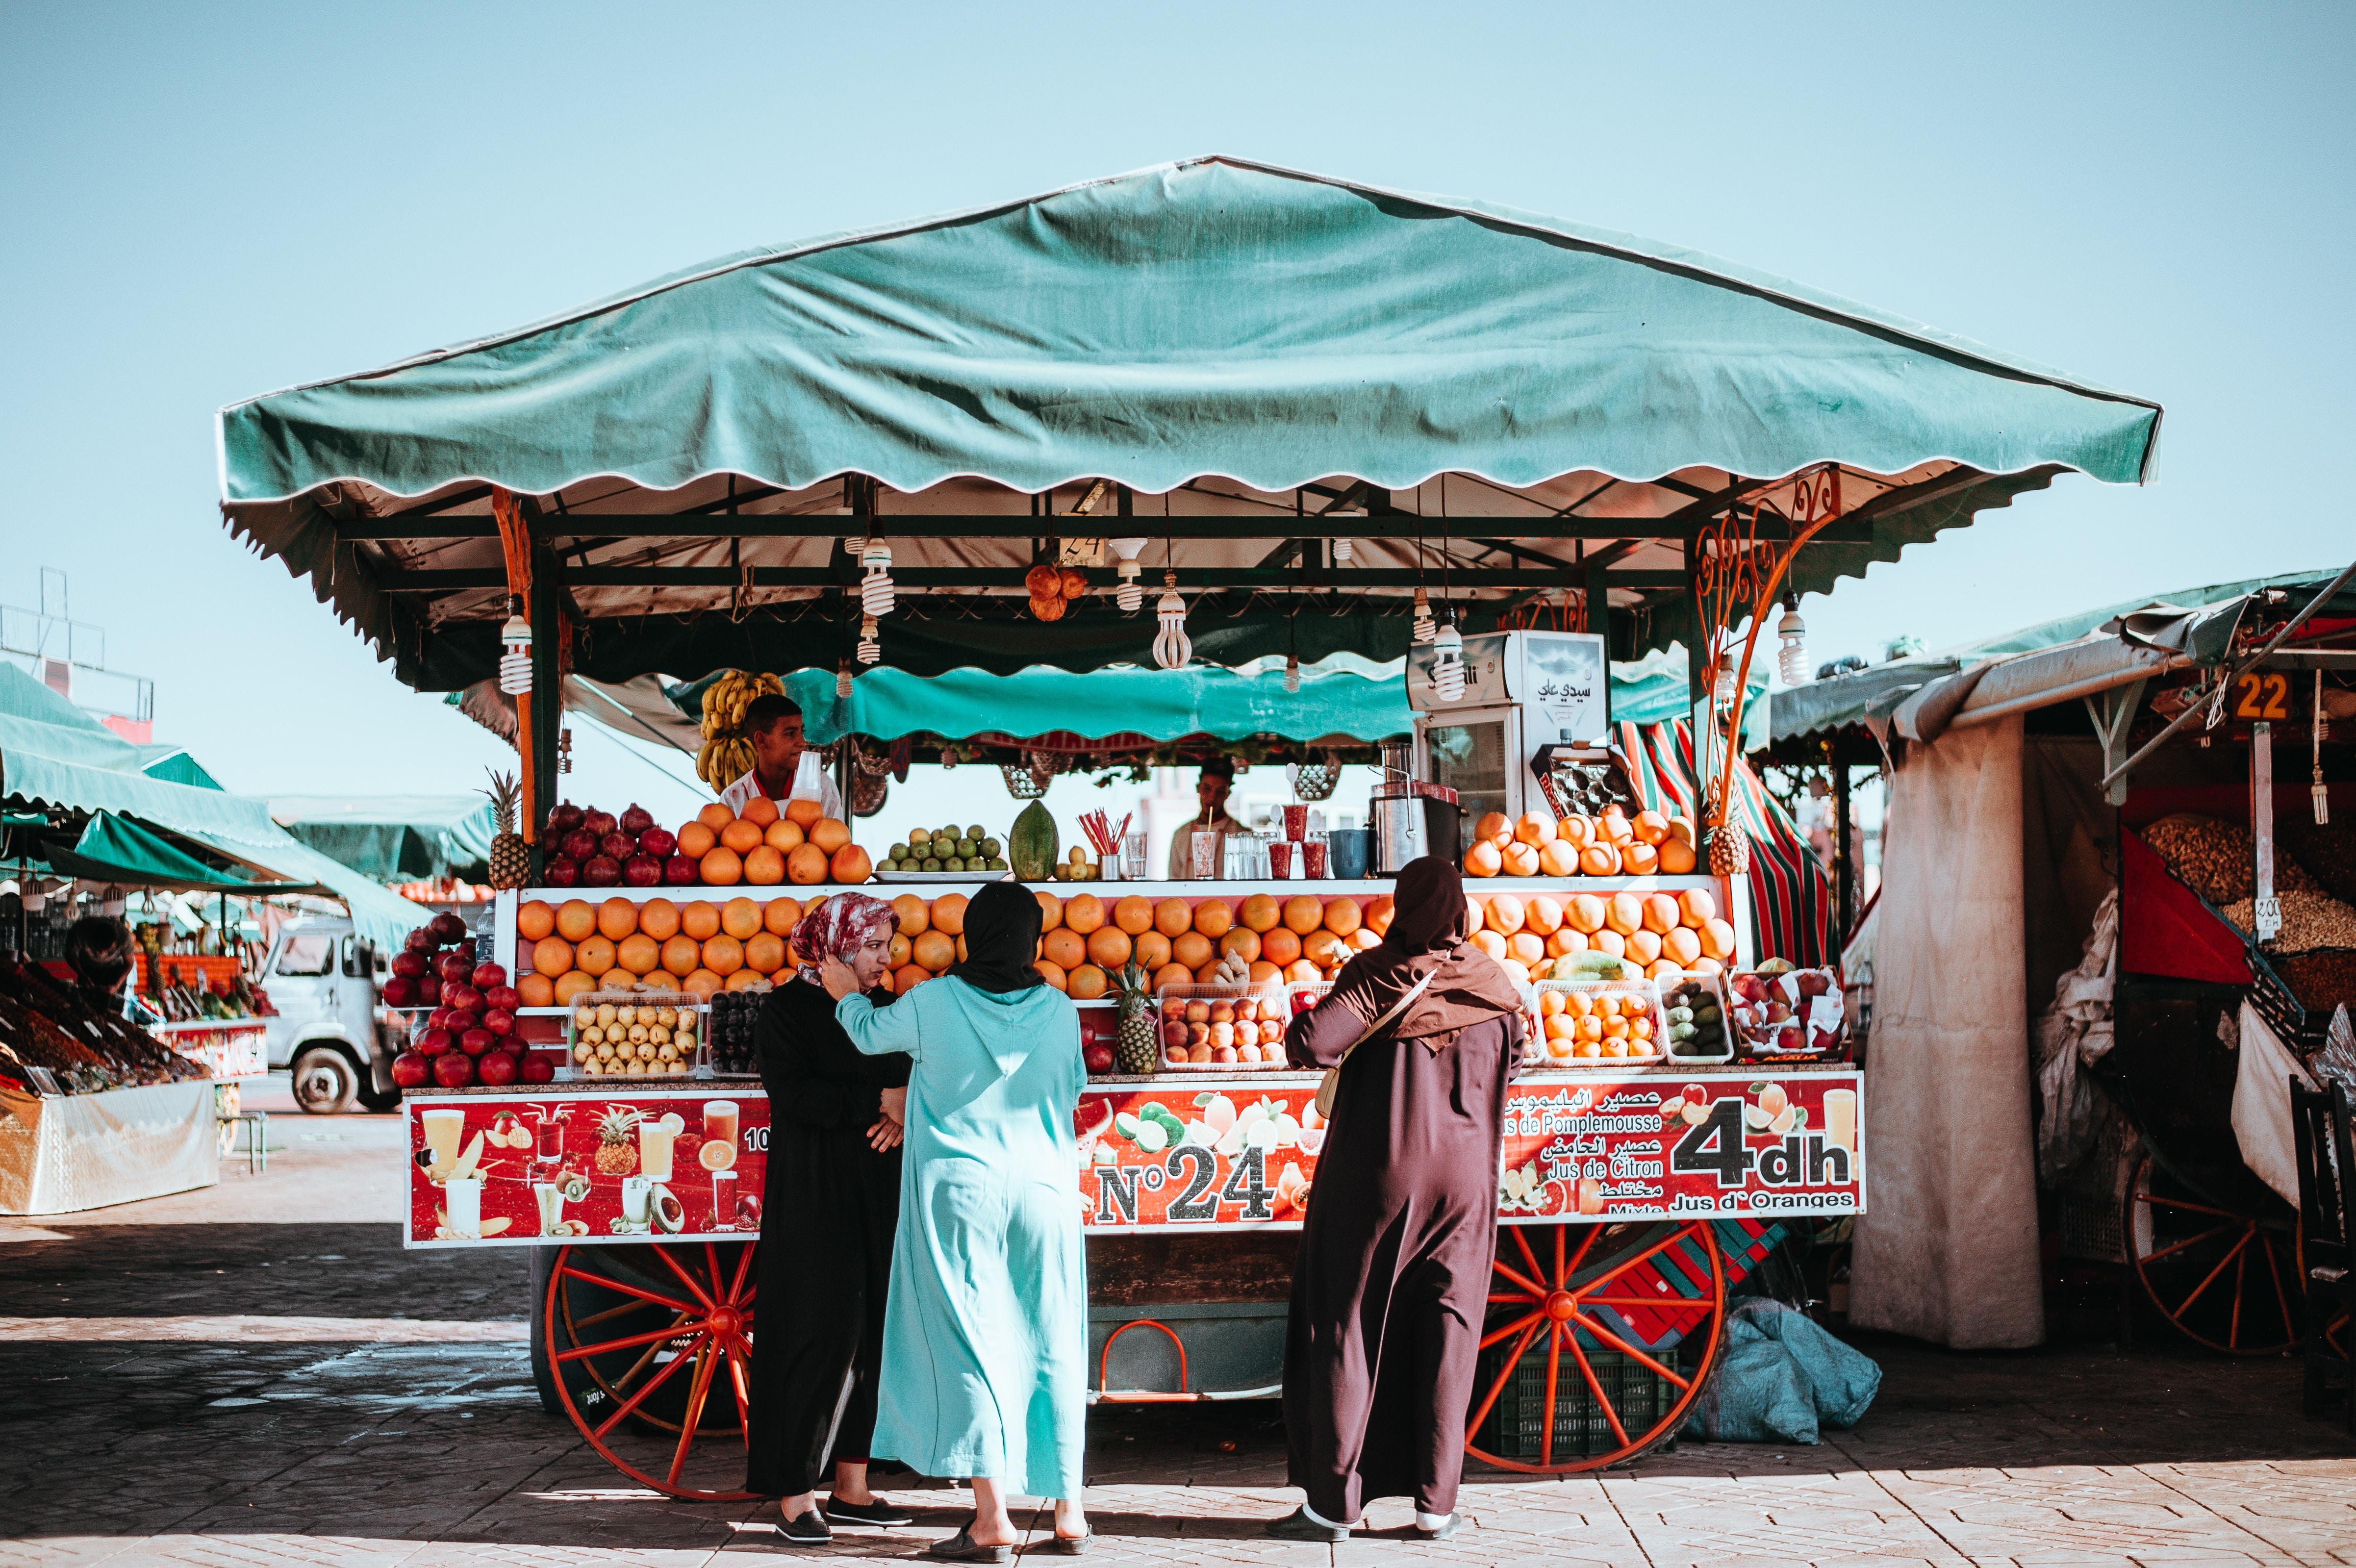 Marakkesh, Morocco